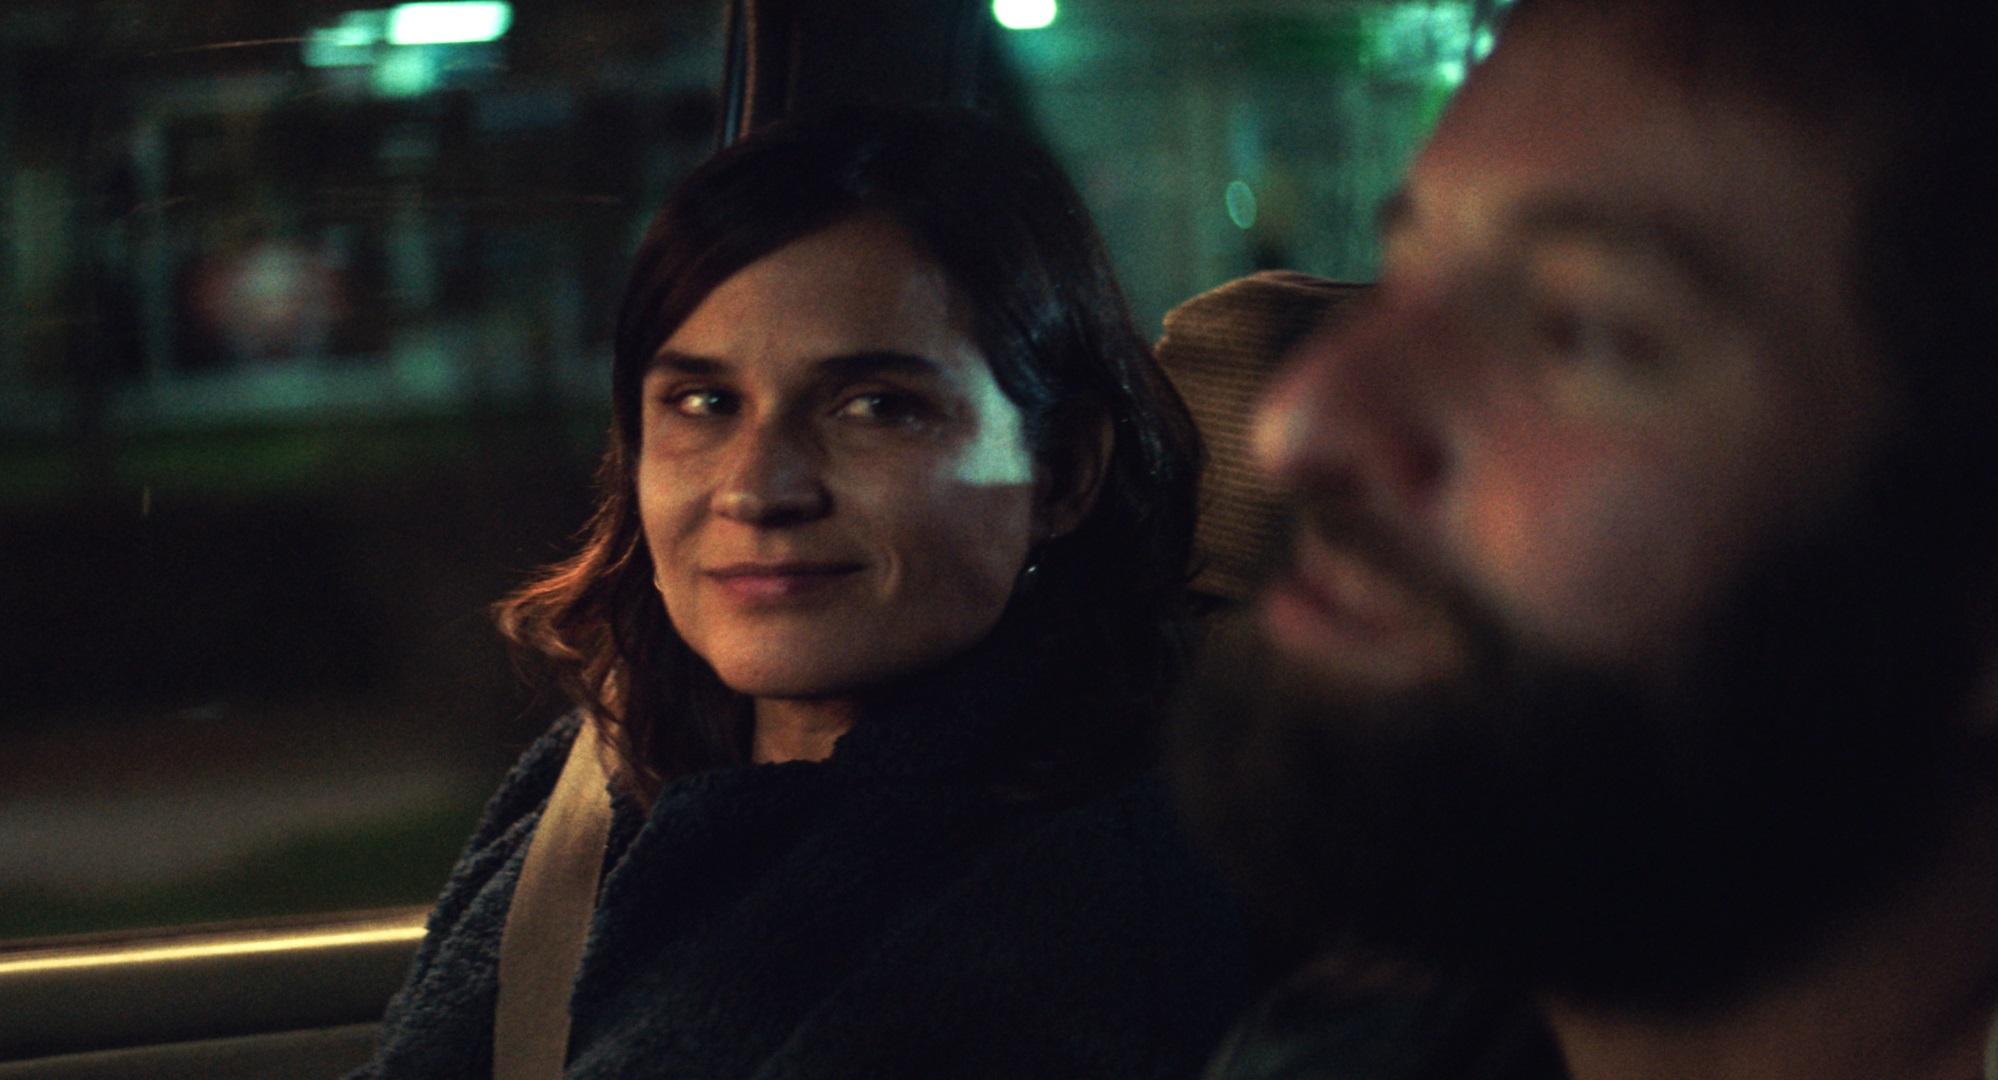 Carolina Sanín in a car scene in the film Litigante.